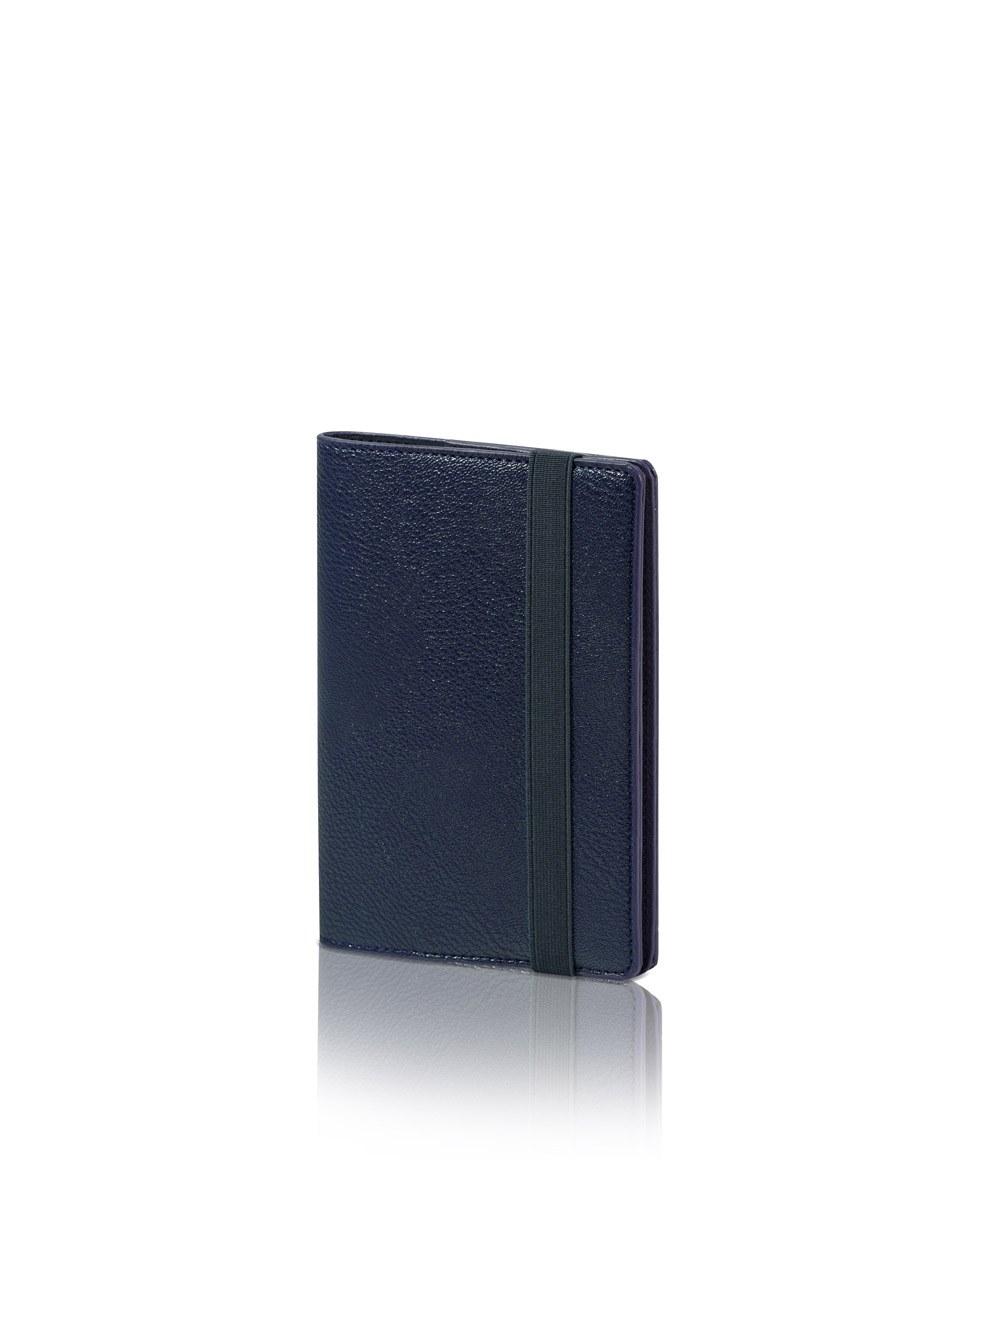 James Cover A6 - Classic Blue